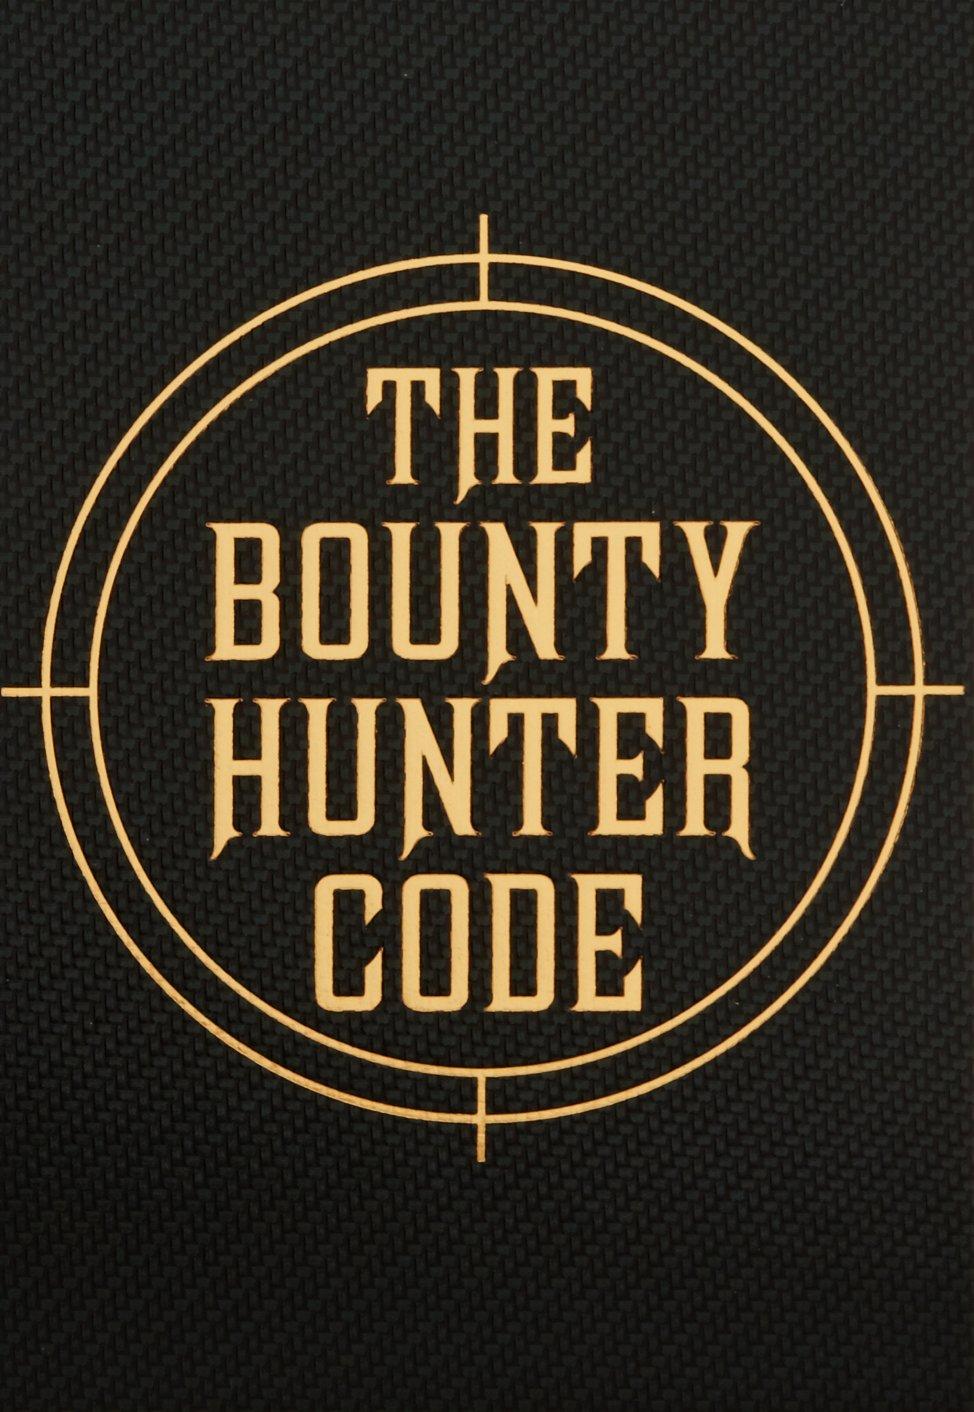 The bounty hunter code wookieepedia fandom powered by wikia the bounty hunter code buycottarizona Image collections